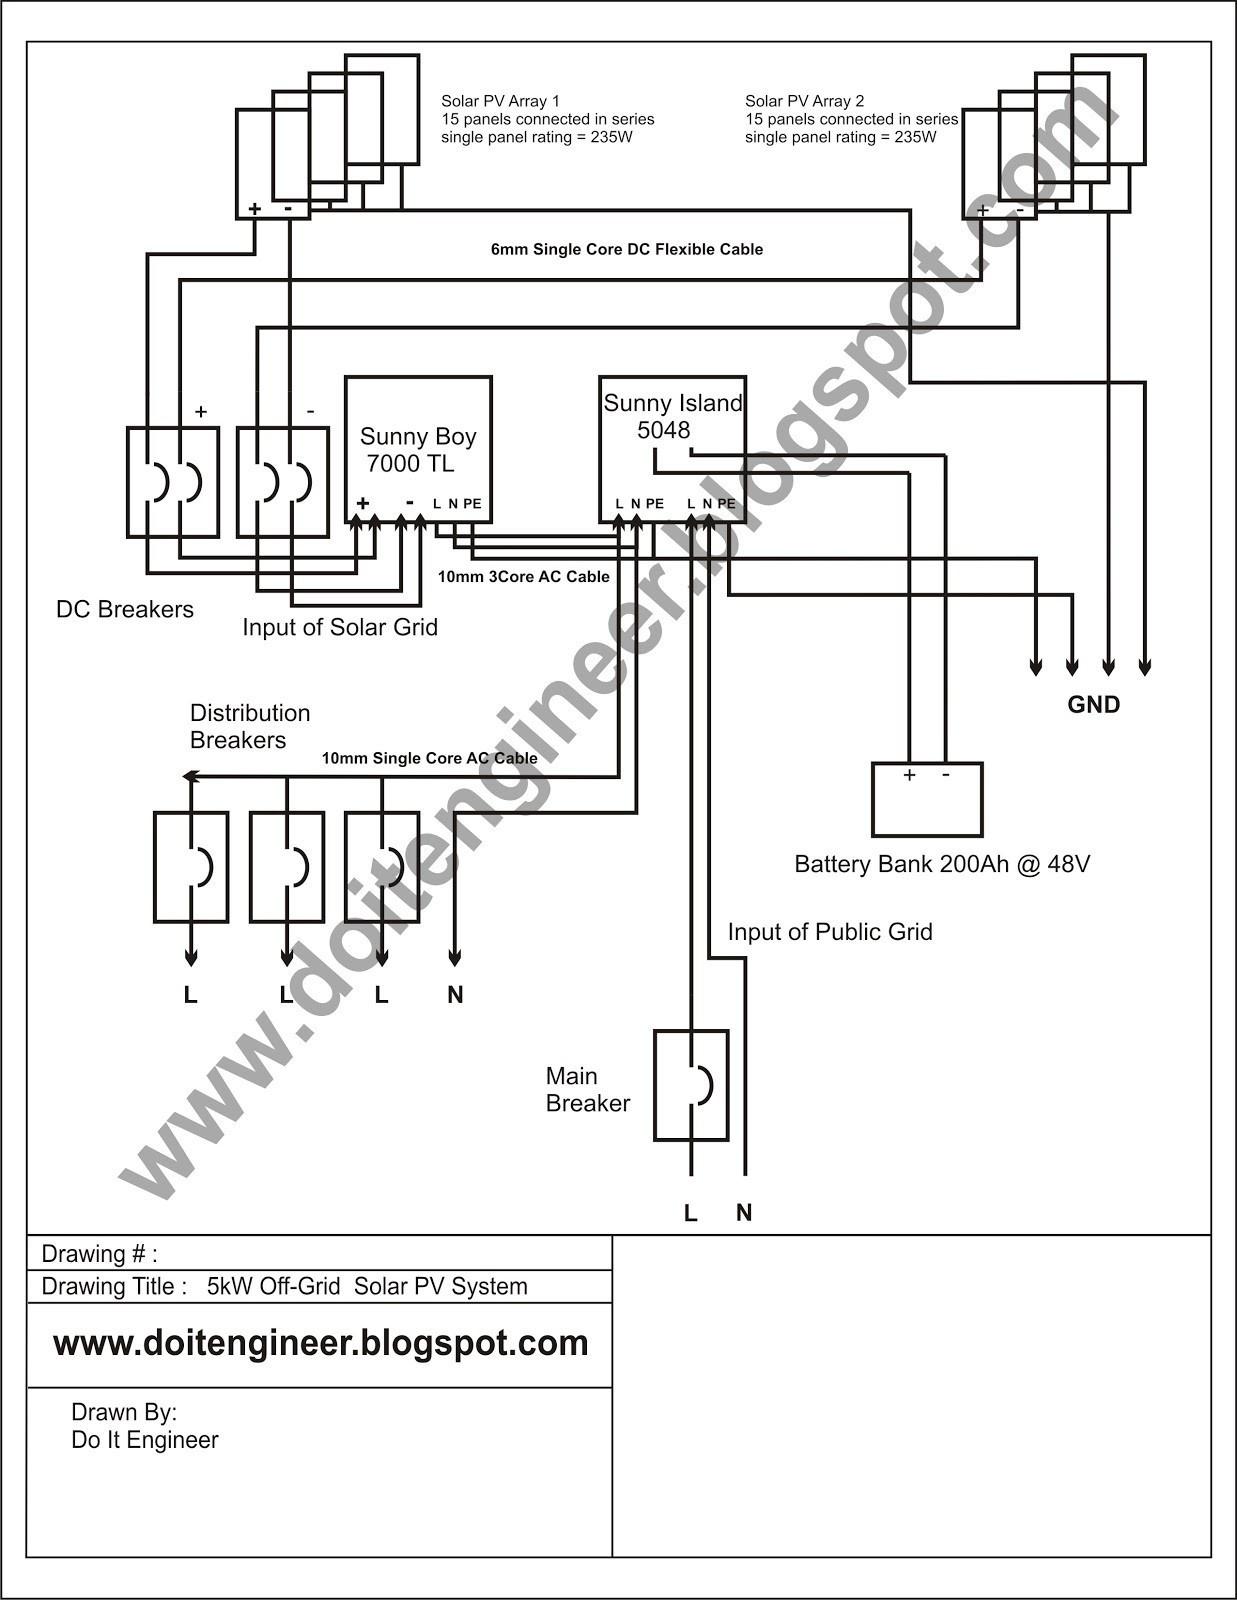 Micro Inverter Wiring Diagram Refrence Solar System Wiring Diagram New 5kw F Grid Solar Pv System Design